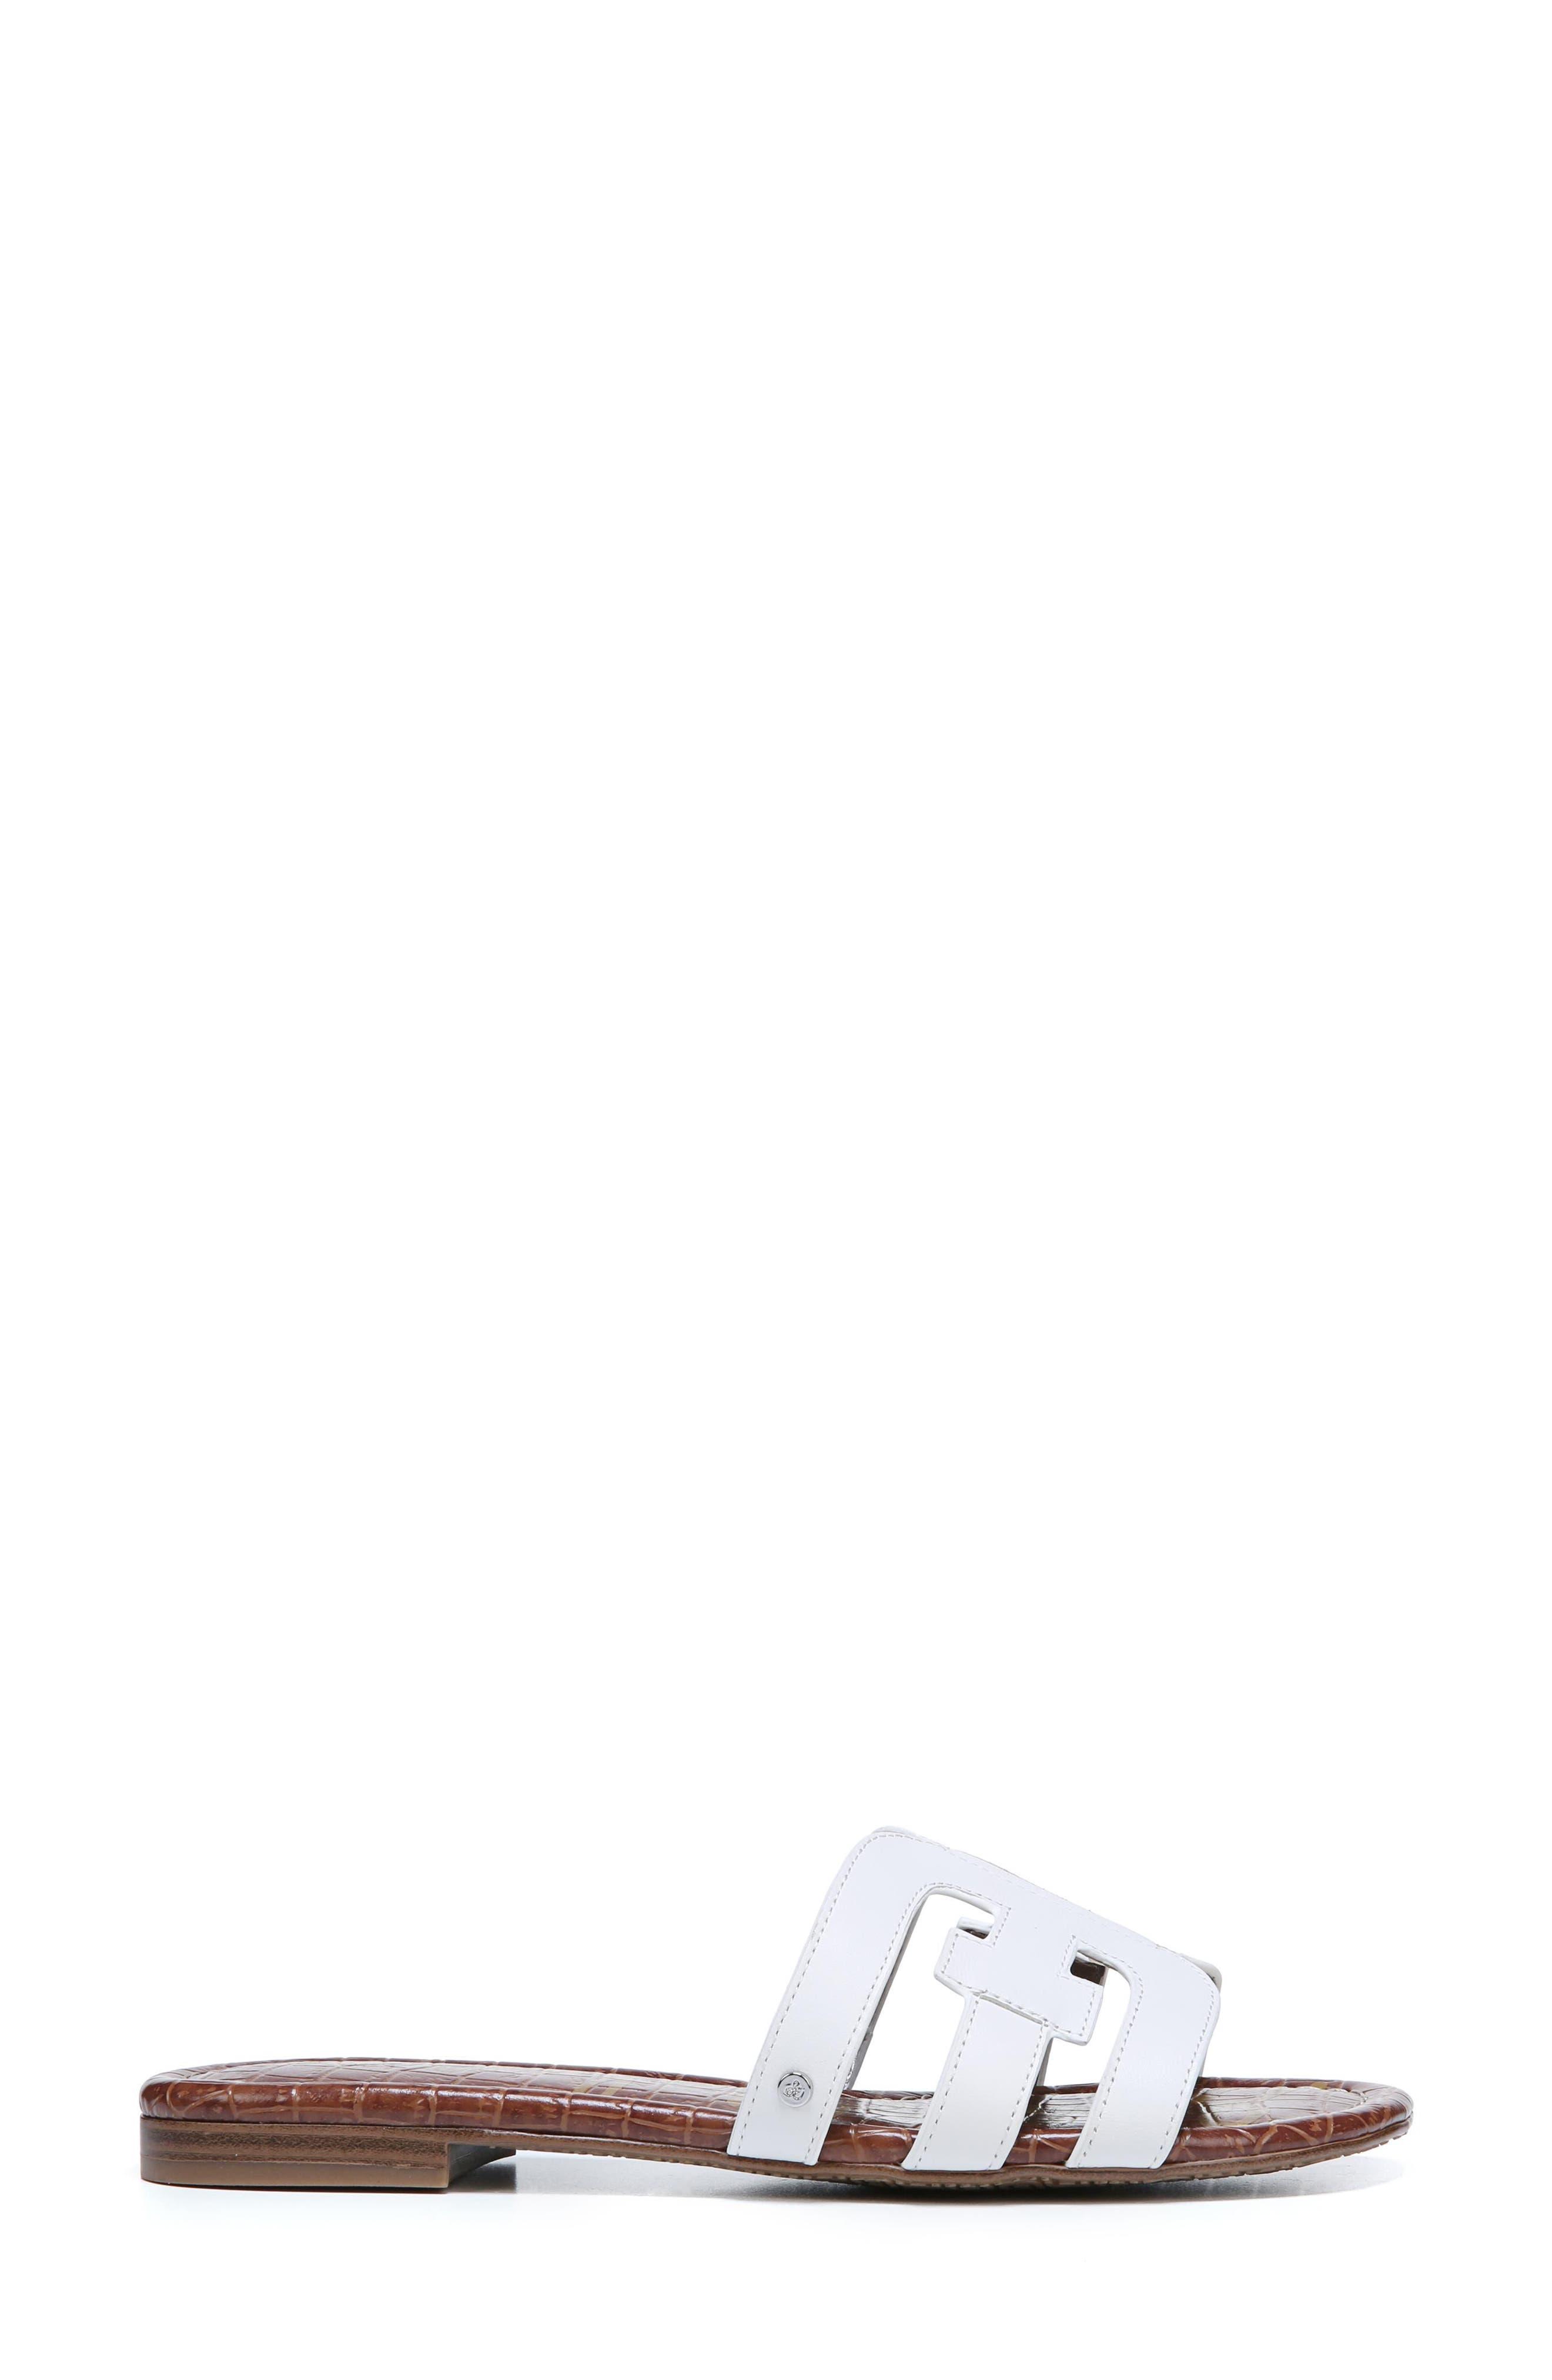 Bay Cutout Slide Sandal,                             Alternate thumbnail 3, color,                             Bright White Leather